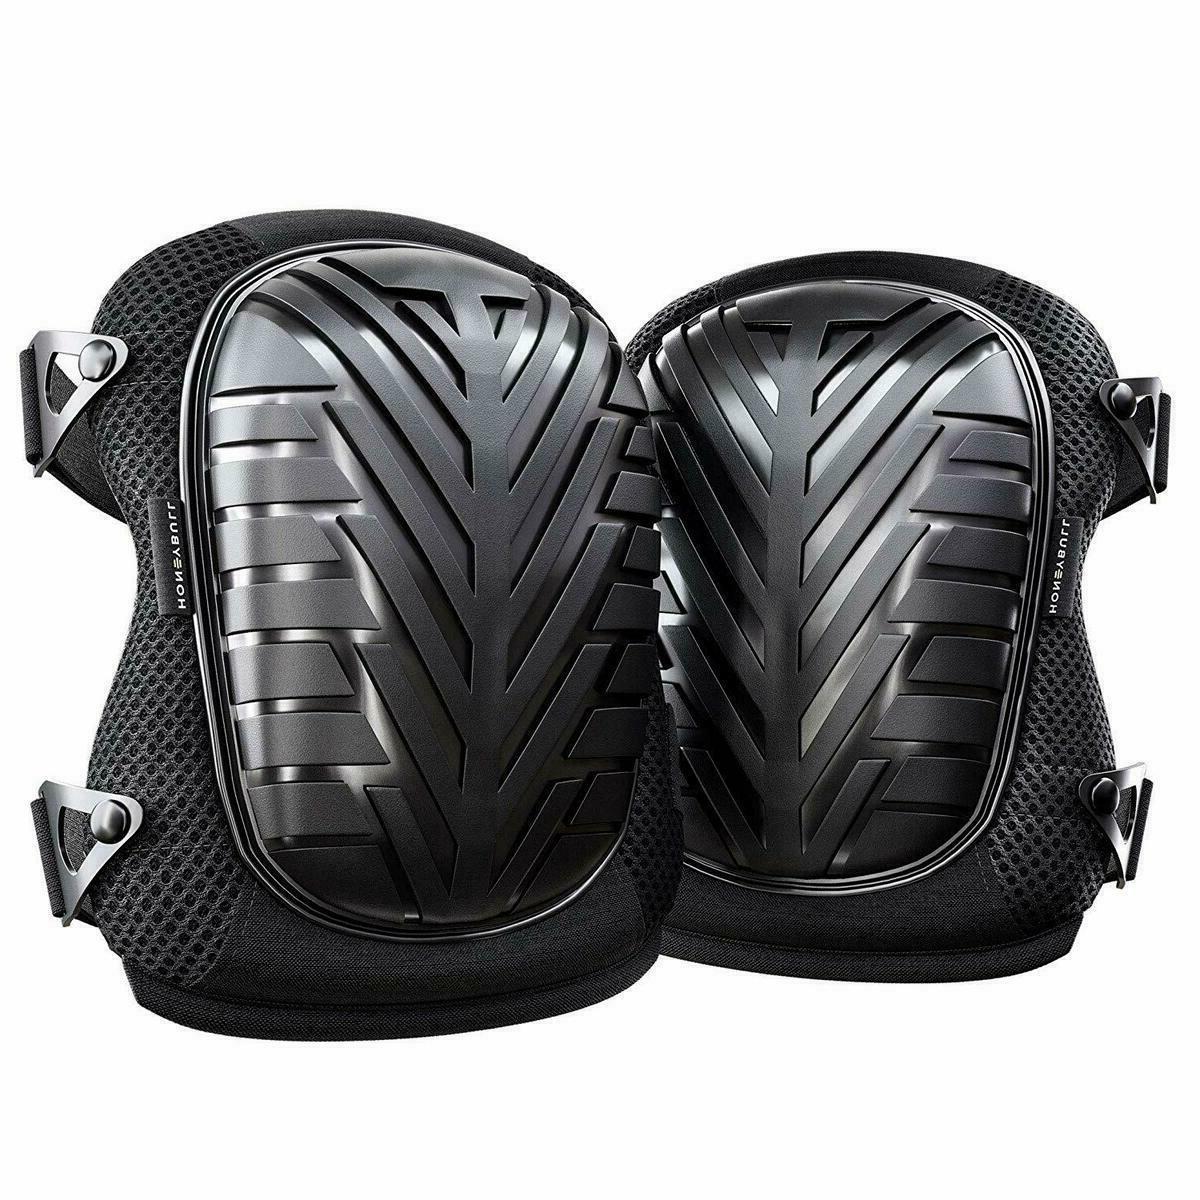 professional knee pads with heavy duty foam